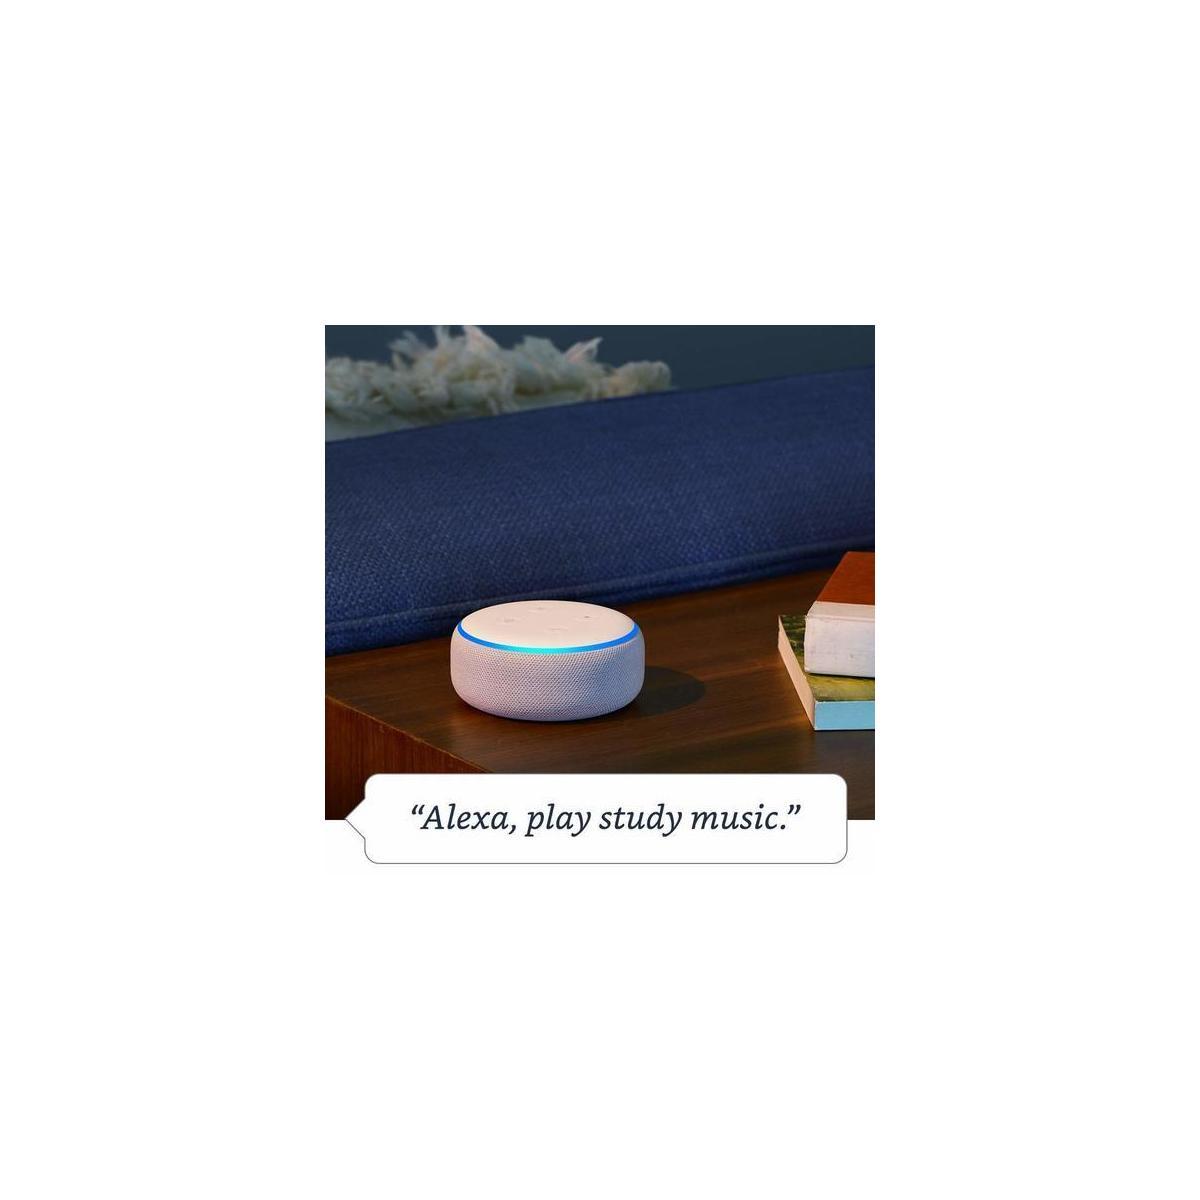 Echo Dot (3rd Gen) - Smart speaker with Alexa - (Charcoal - Heather Gray - Sandstone)